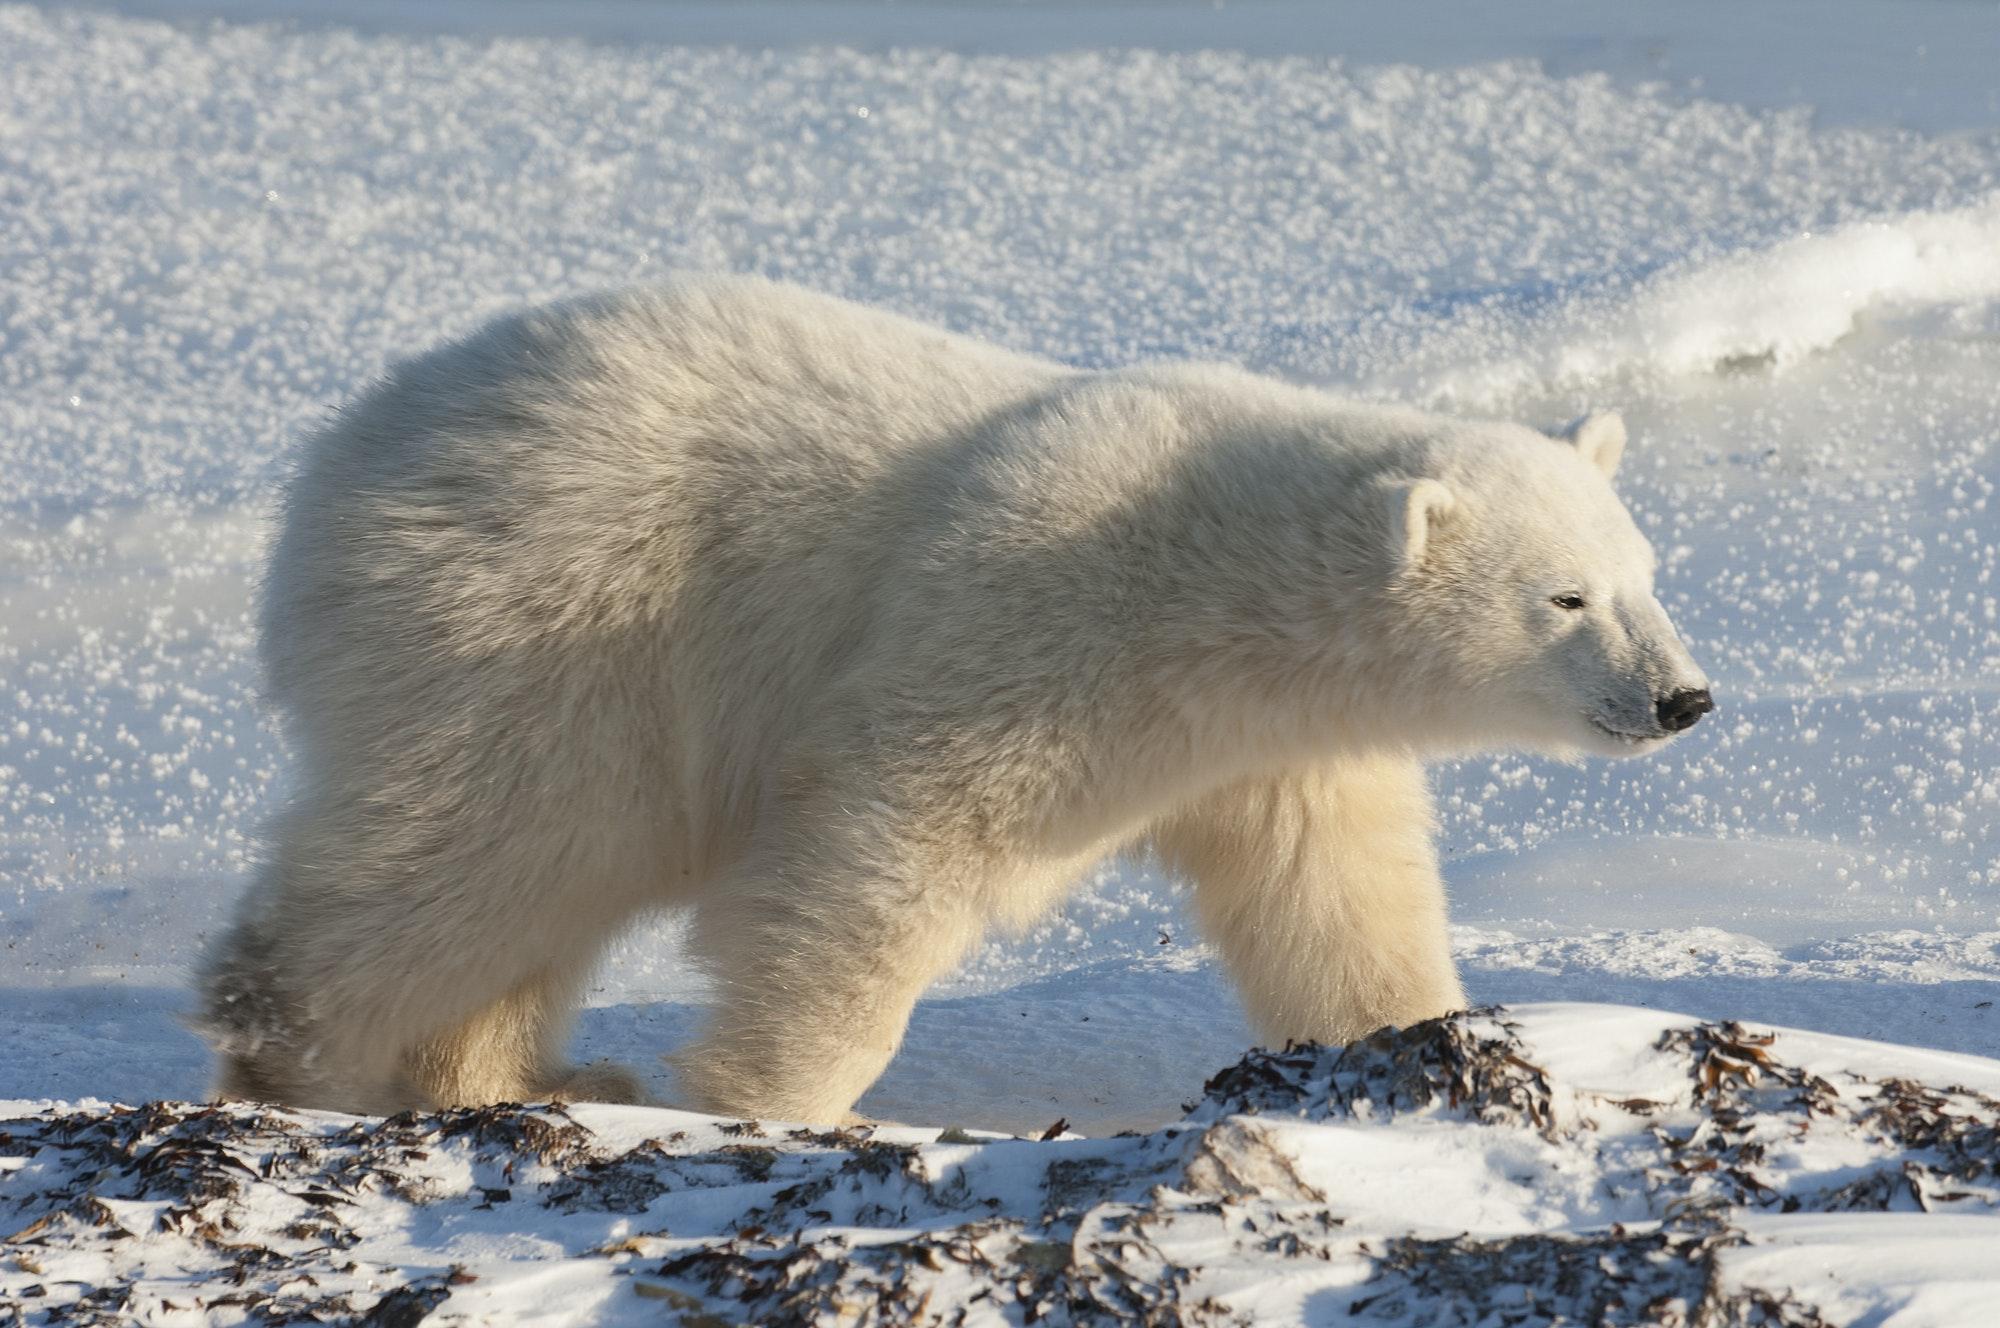 A polar bear on a snowfield in Manitoba.